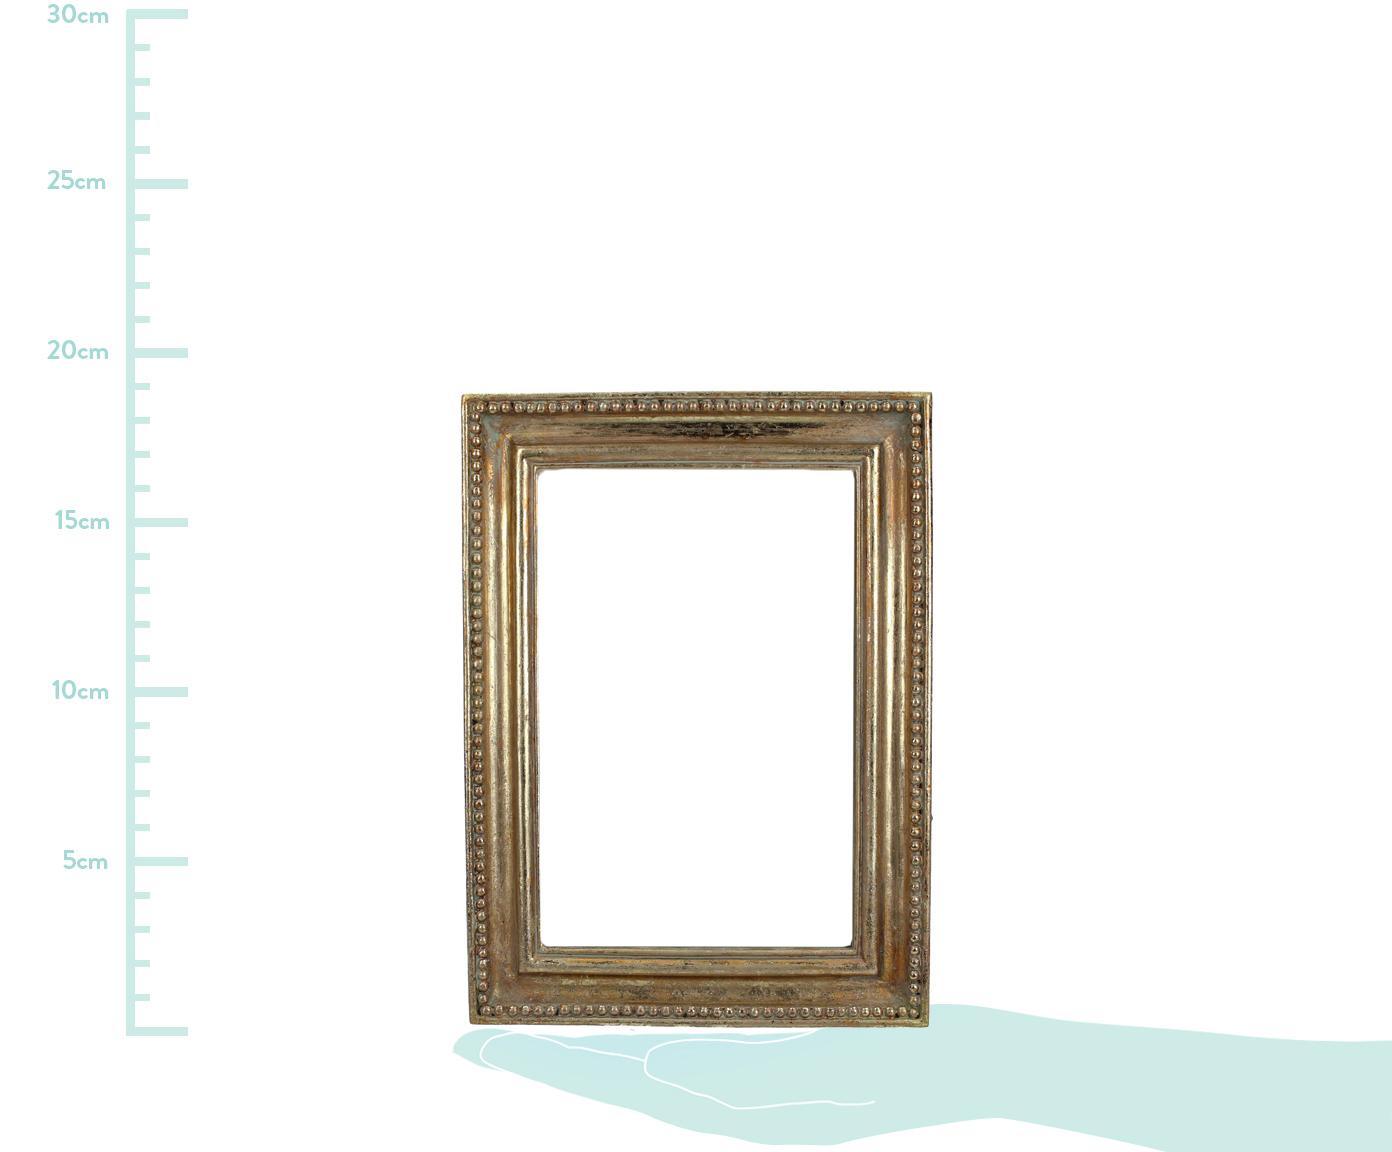 Bilderrahmen Antique, Rahmen: Polyresin, Front: Glas, Goldfarben, 10 x 15 cm